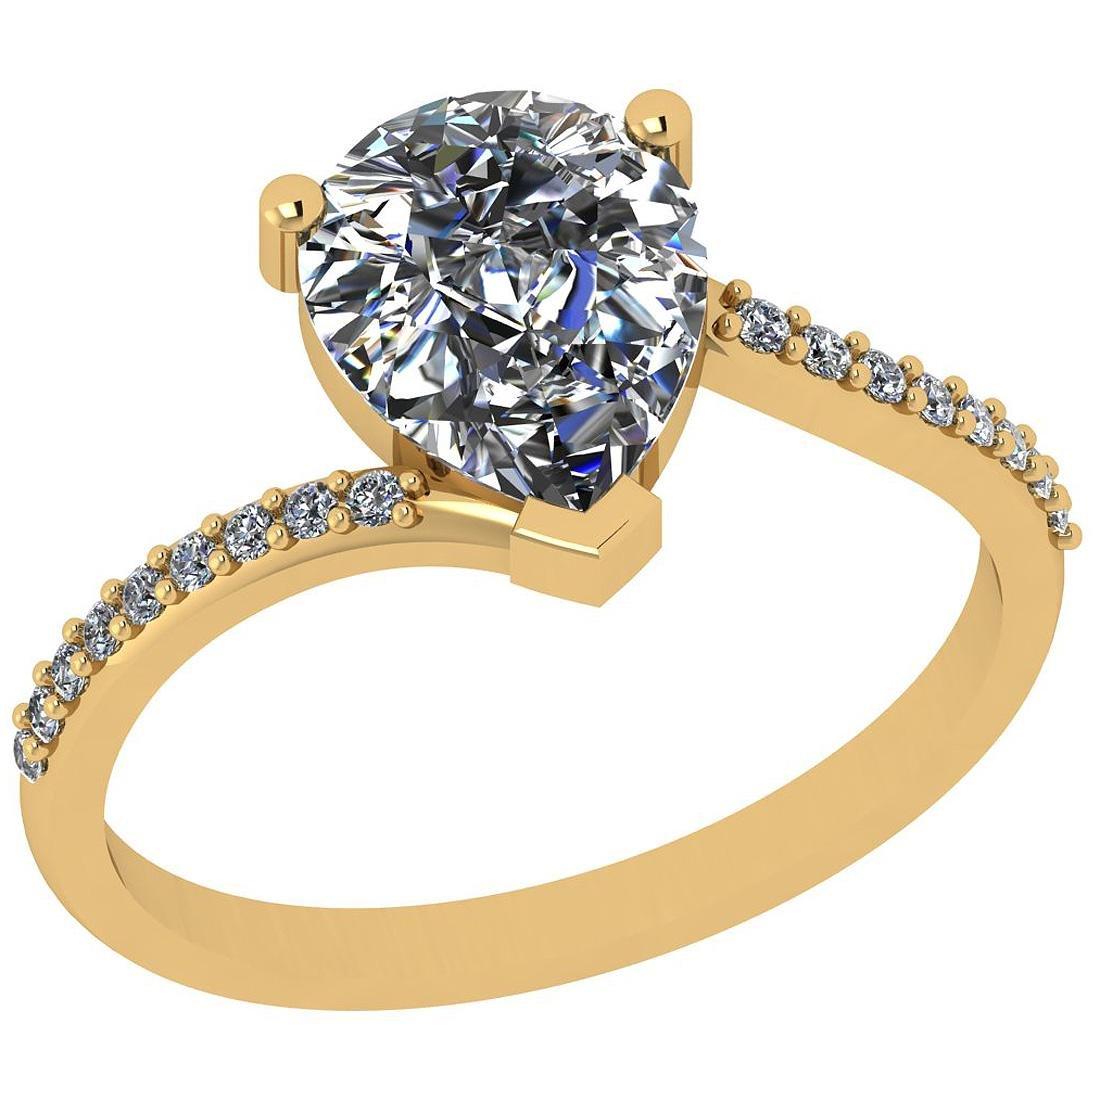 Certified 0.85 Ctw Diamond I2/I3 10k Yellow Gold Annive